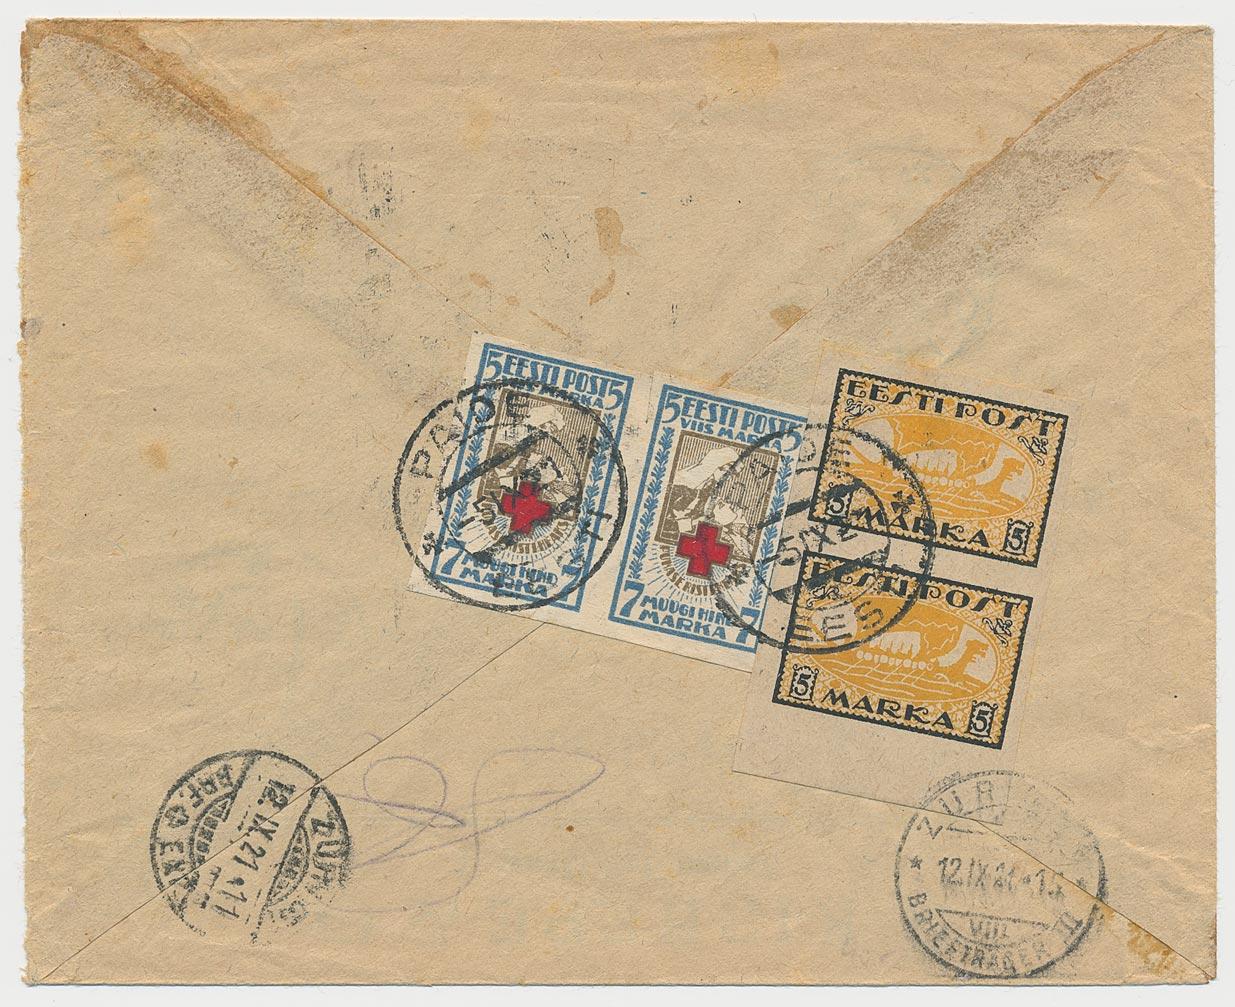 0344b-Paide-Zürich-punane-rist-1921